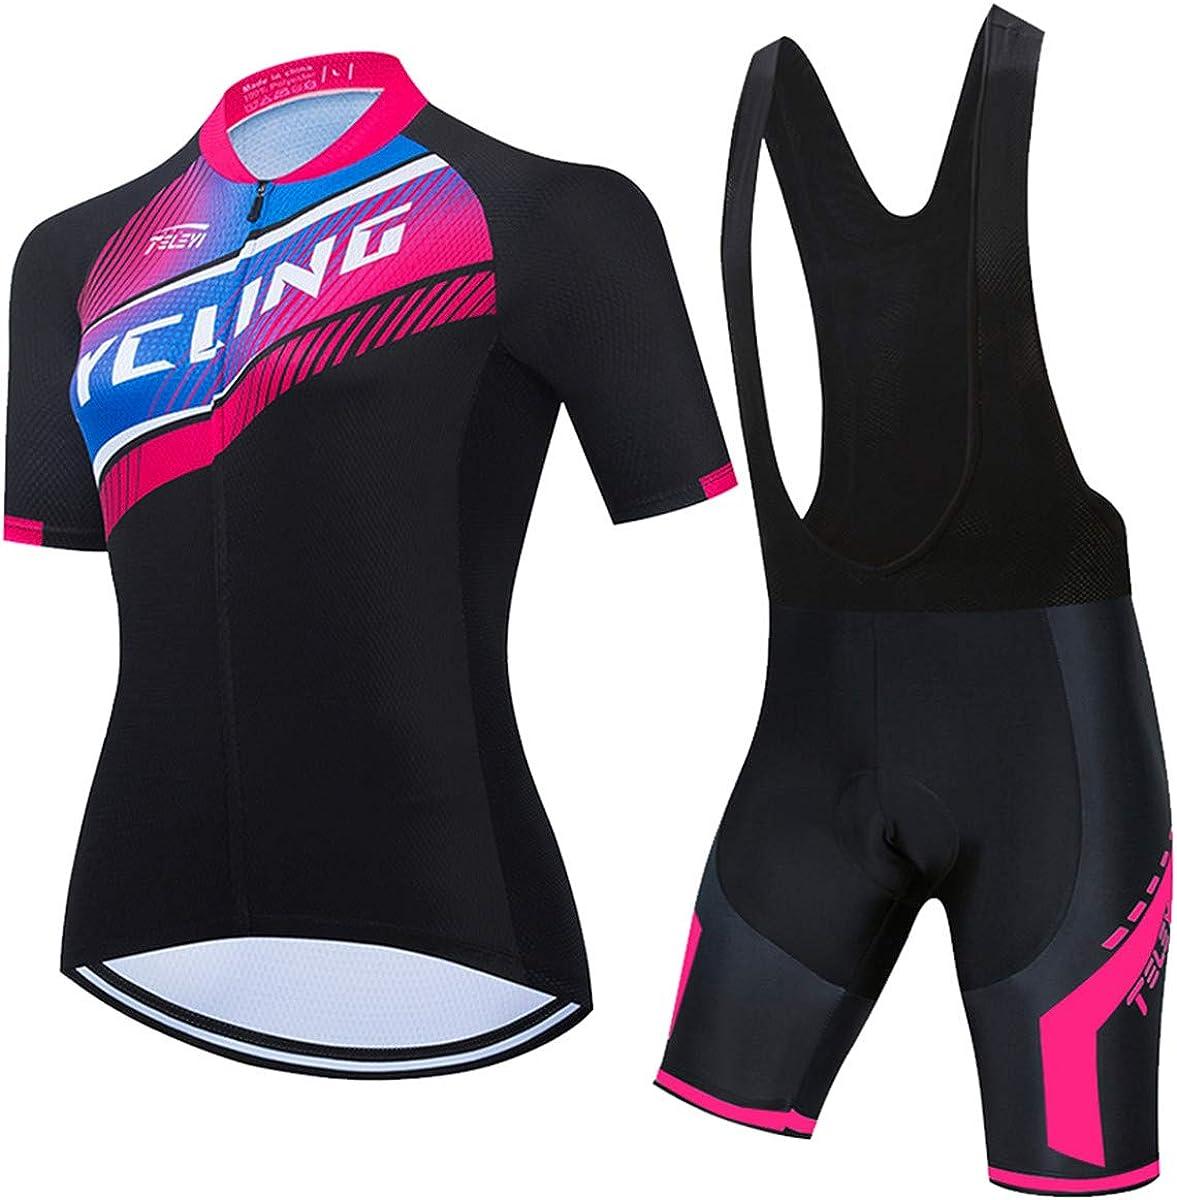 PSPORT Women's Cycling Jersey Bib Bike Ranking TOP5 Sets store Shorts Short Sleeve